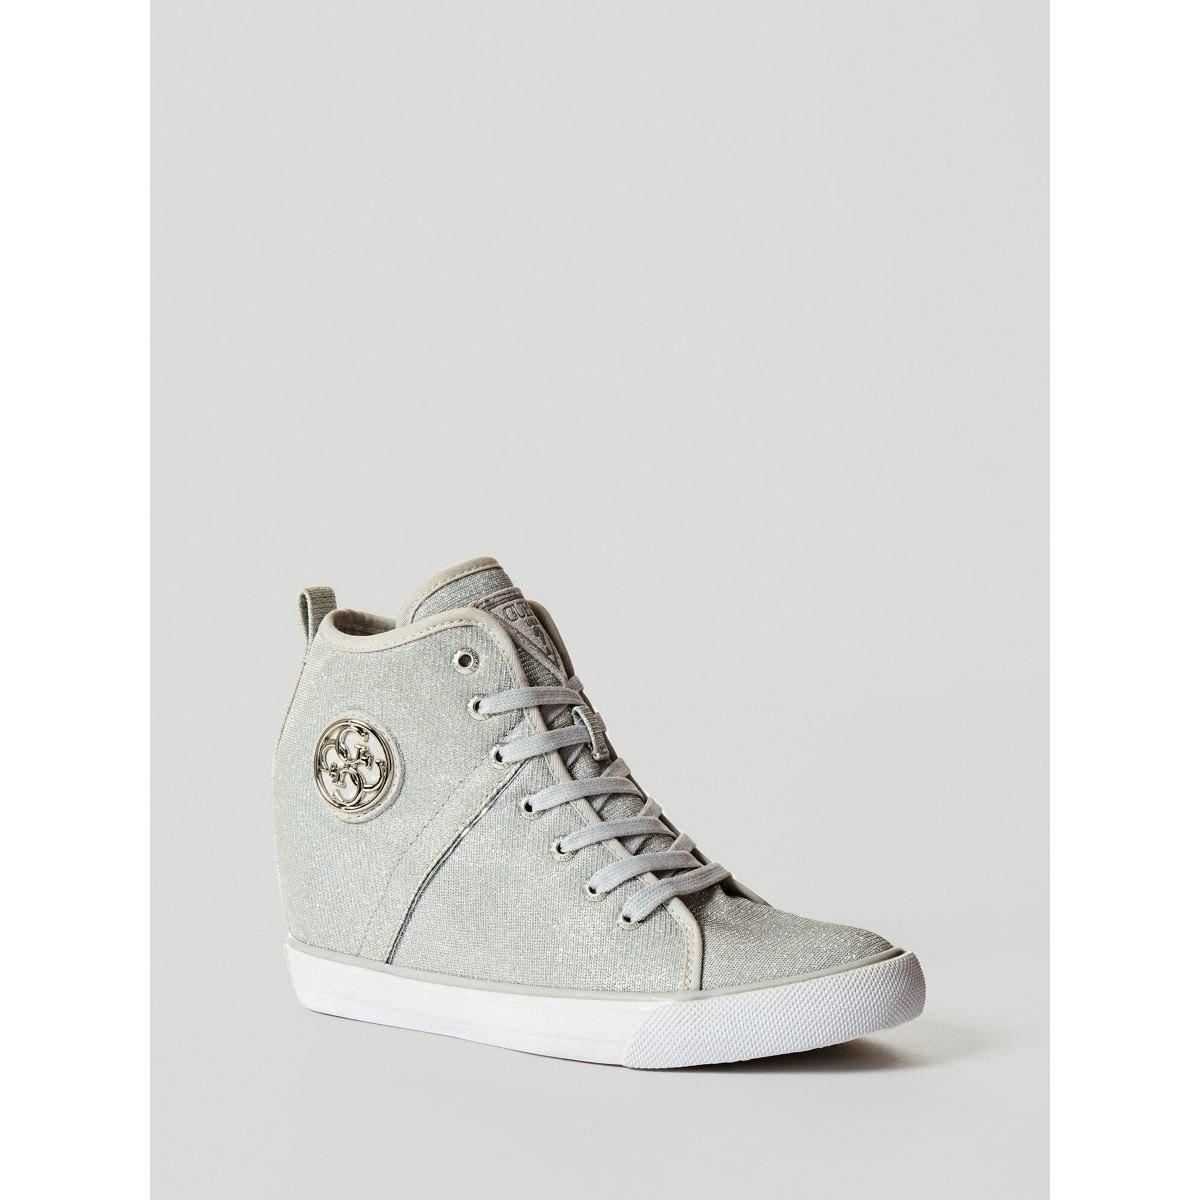 Guess Sneaker online kaufen  silberfarben